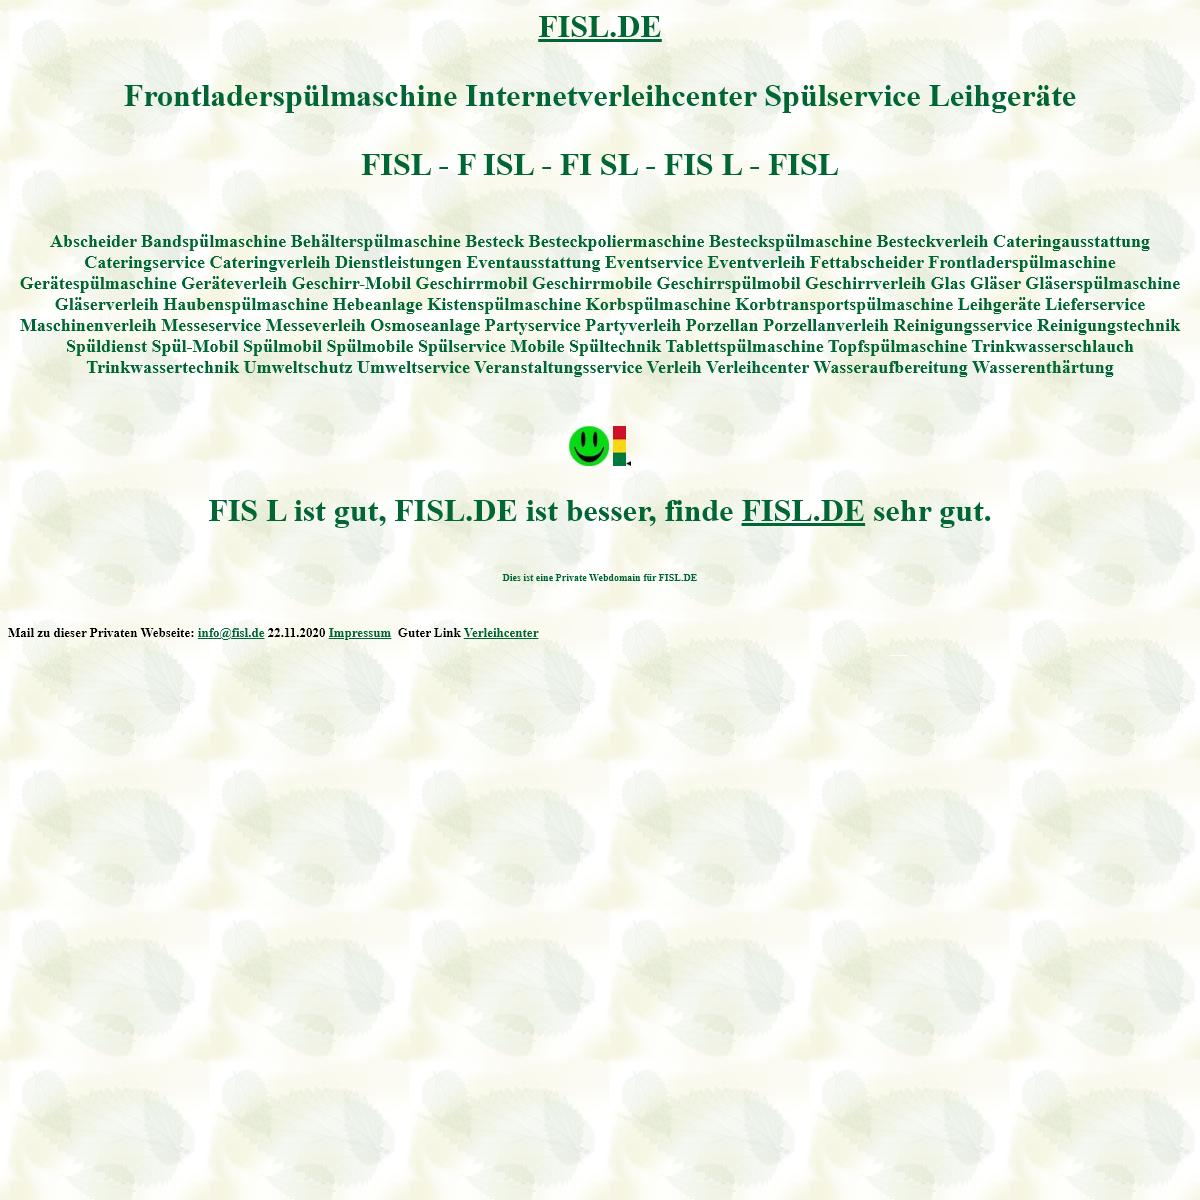 fisl Frontladerspülmaschine verleihcenter Spülservice Leihgeräte Spülmobil Verleih Geschirrmobil Mieten